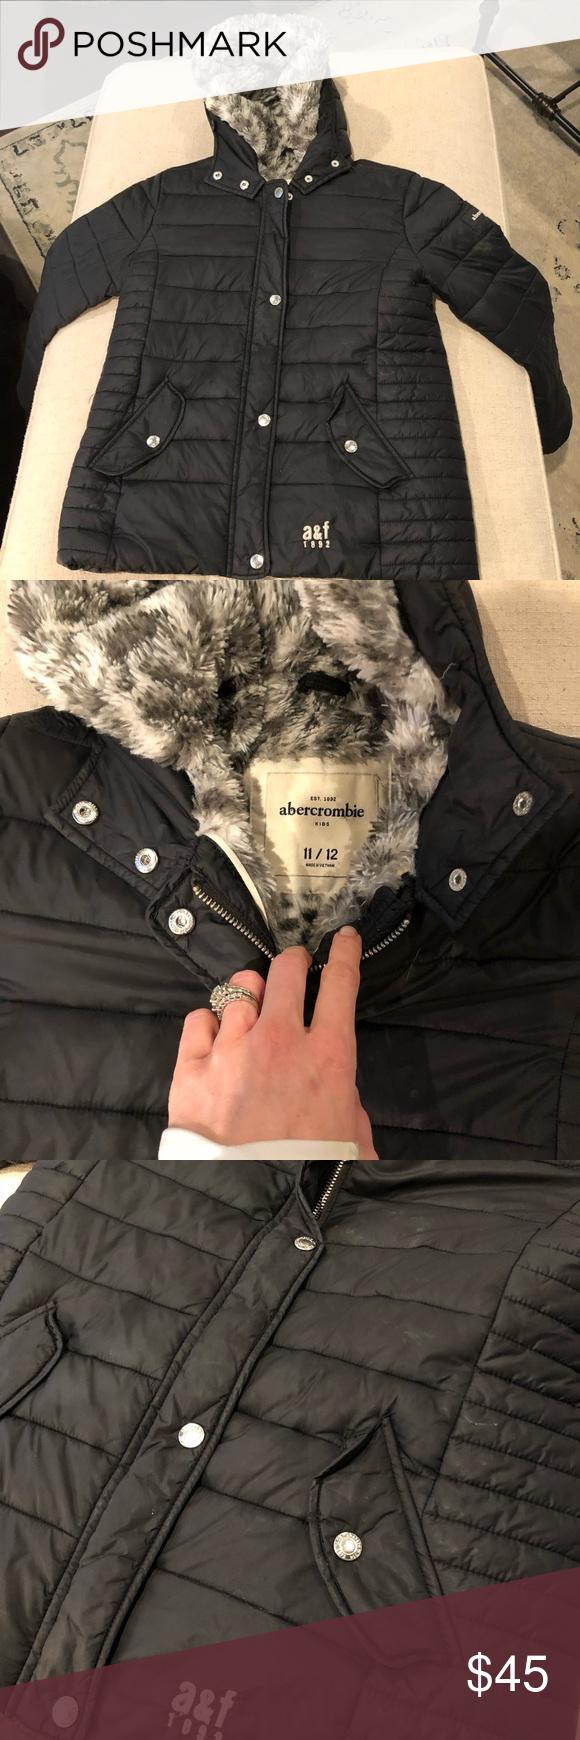 Girls A F Puffer Winter Jacket Winter Jackets Jackets Kids Jacket [ 1740 x 580 Pixel ]